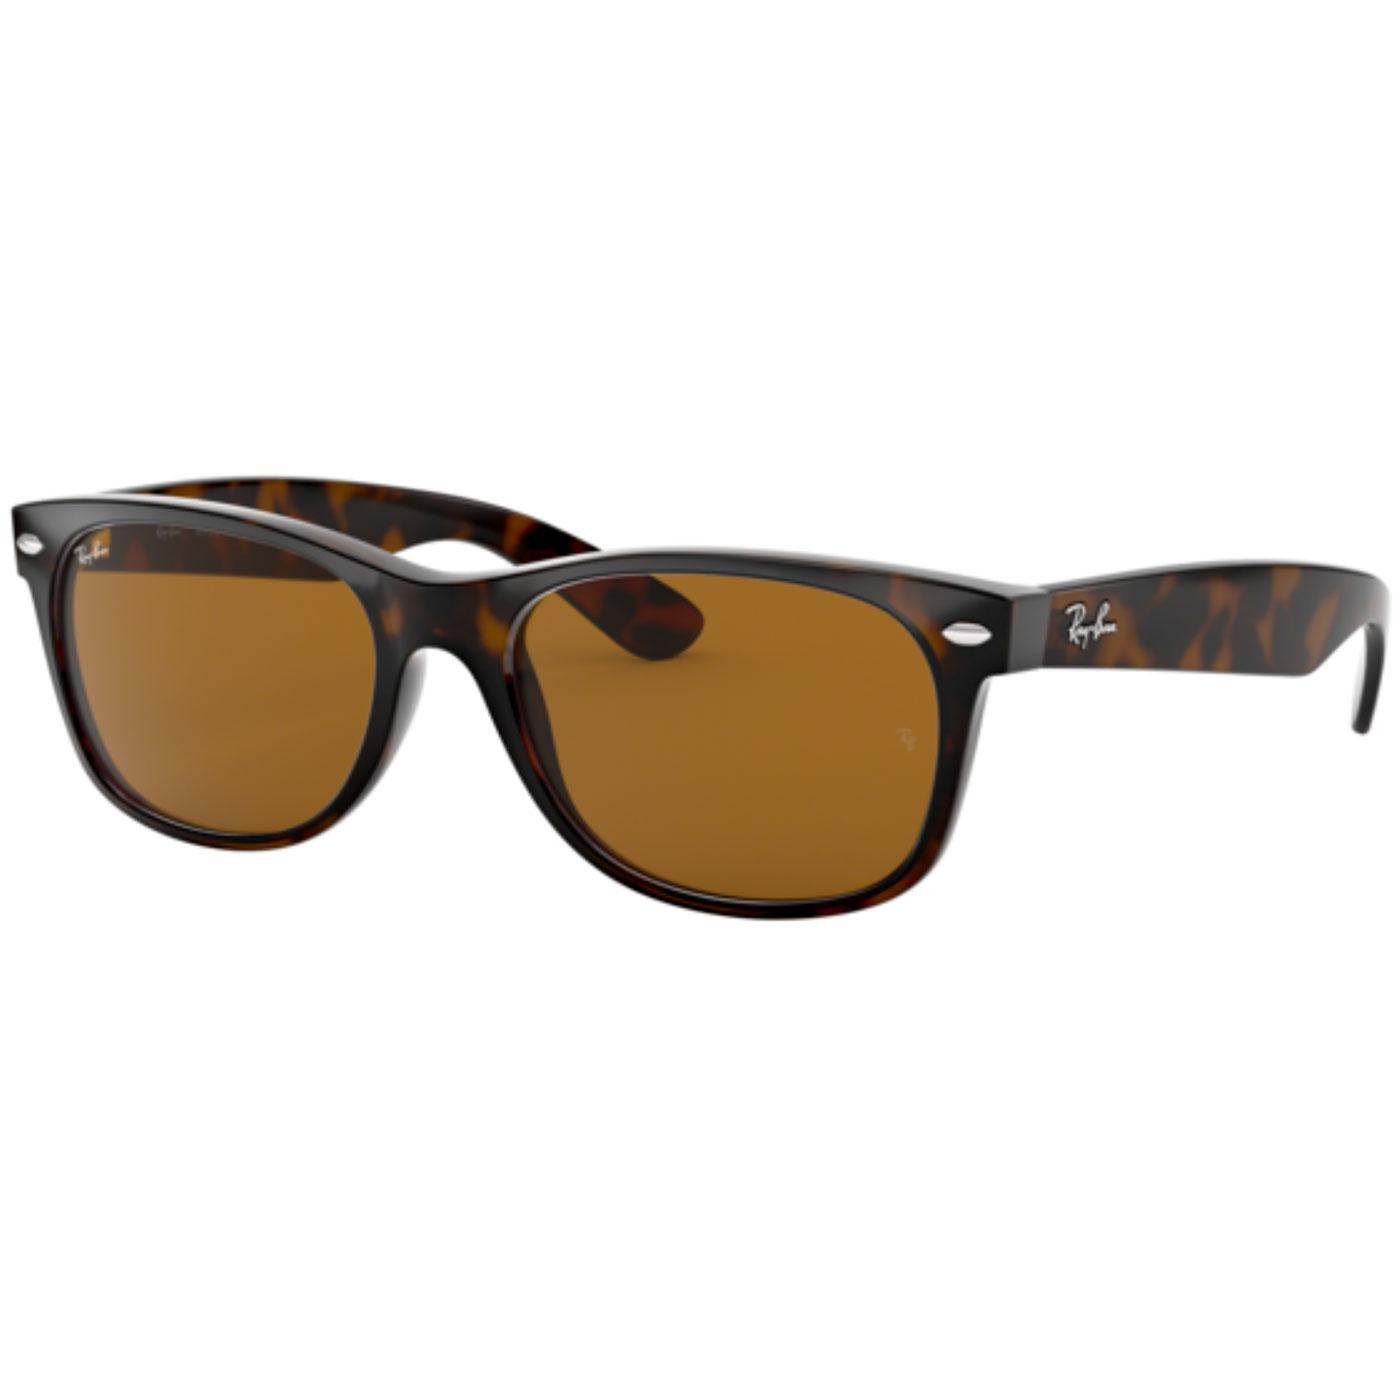 New Wayfarer RAY-BAN Retro Light Havana Sunglasses